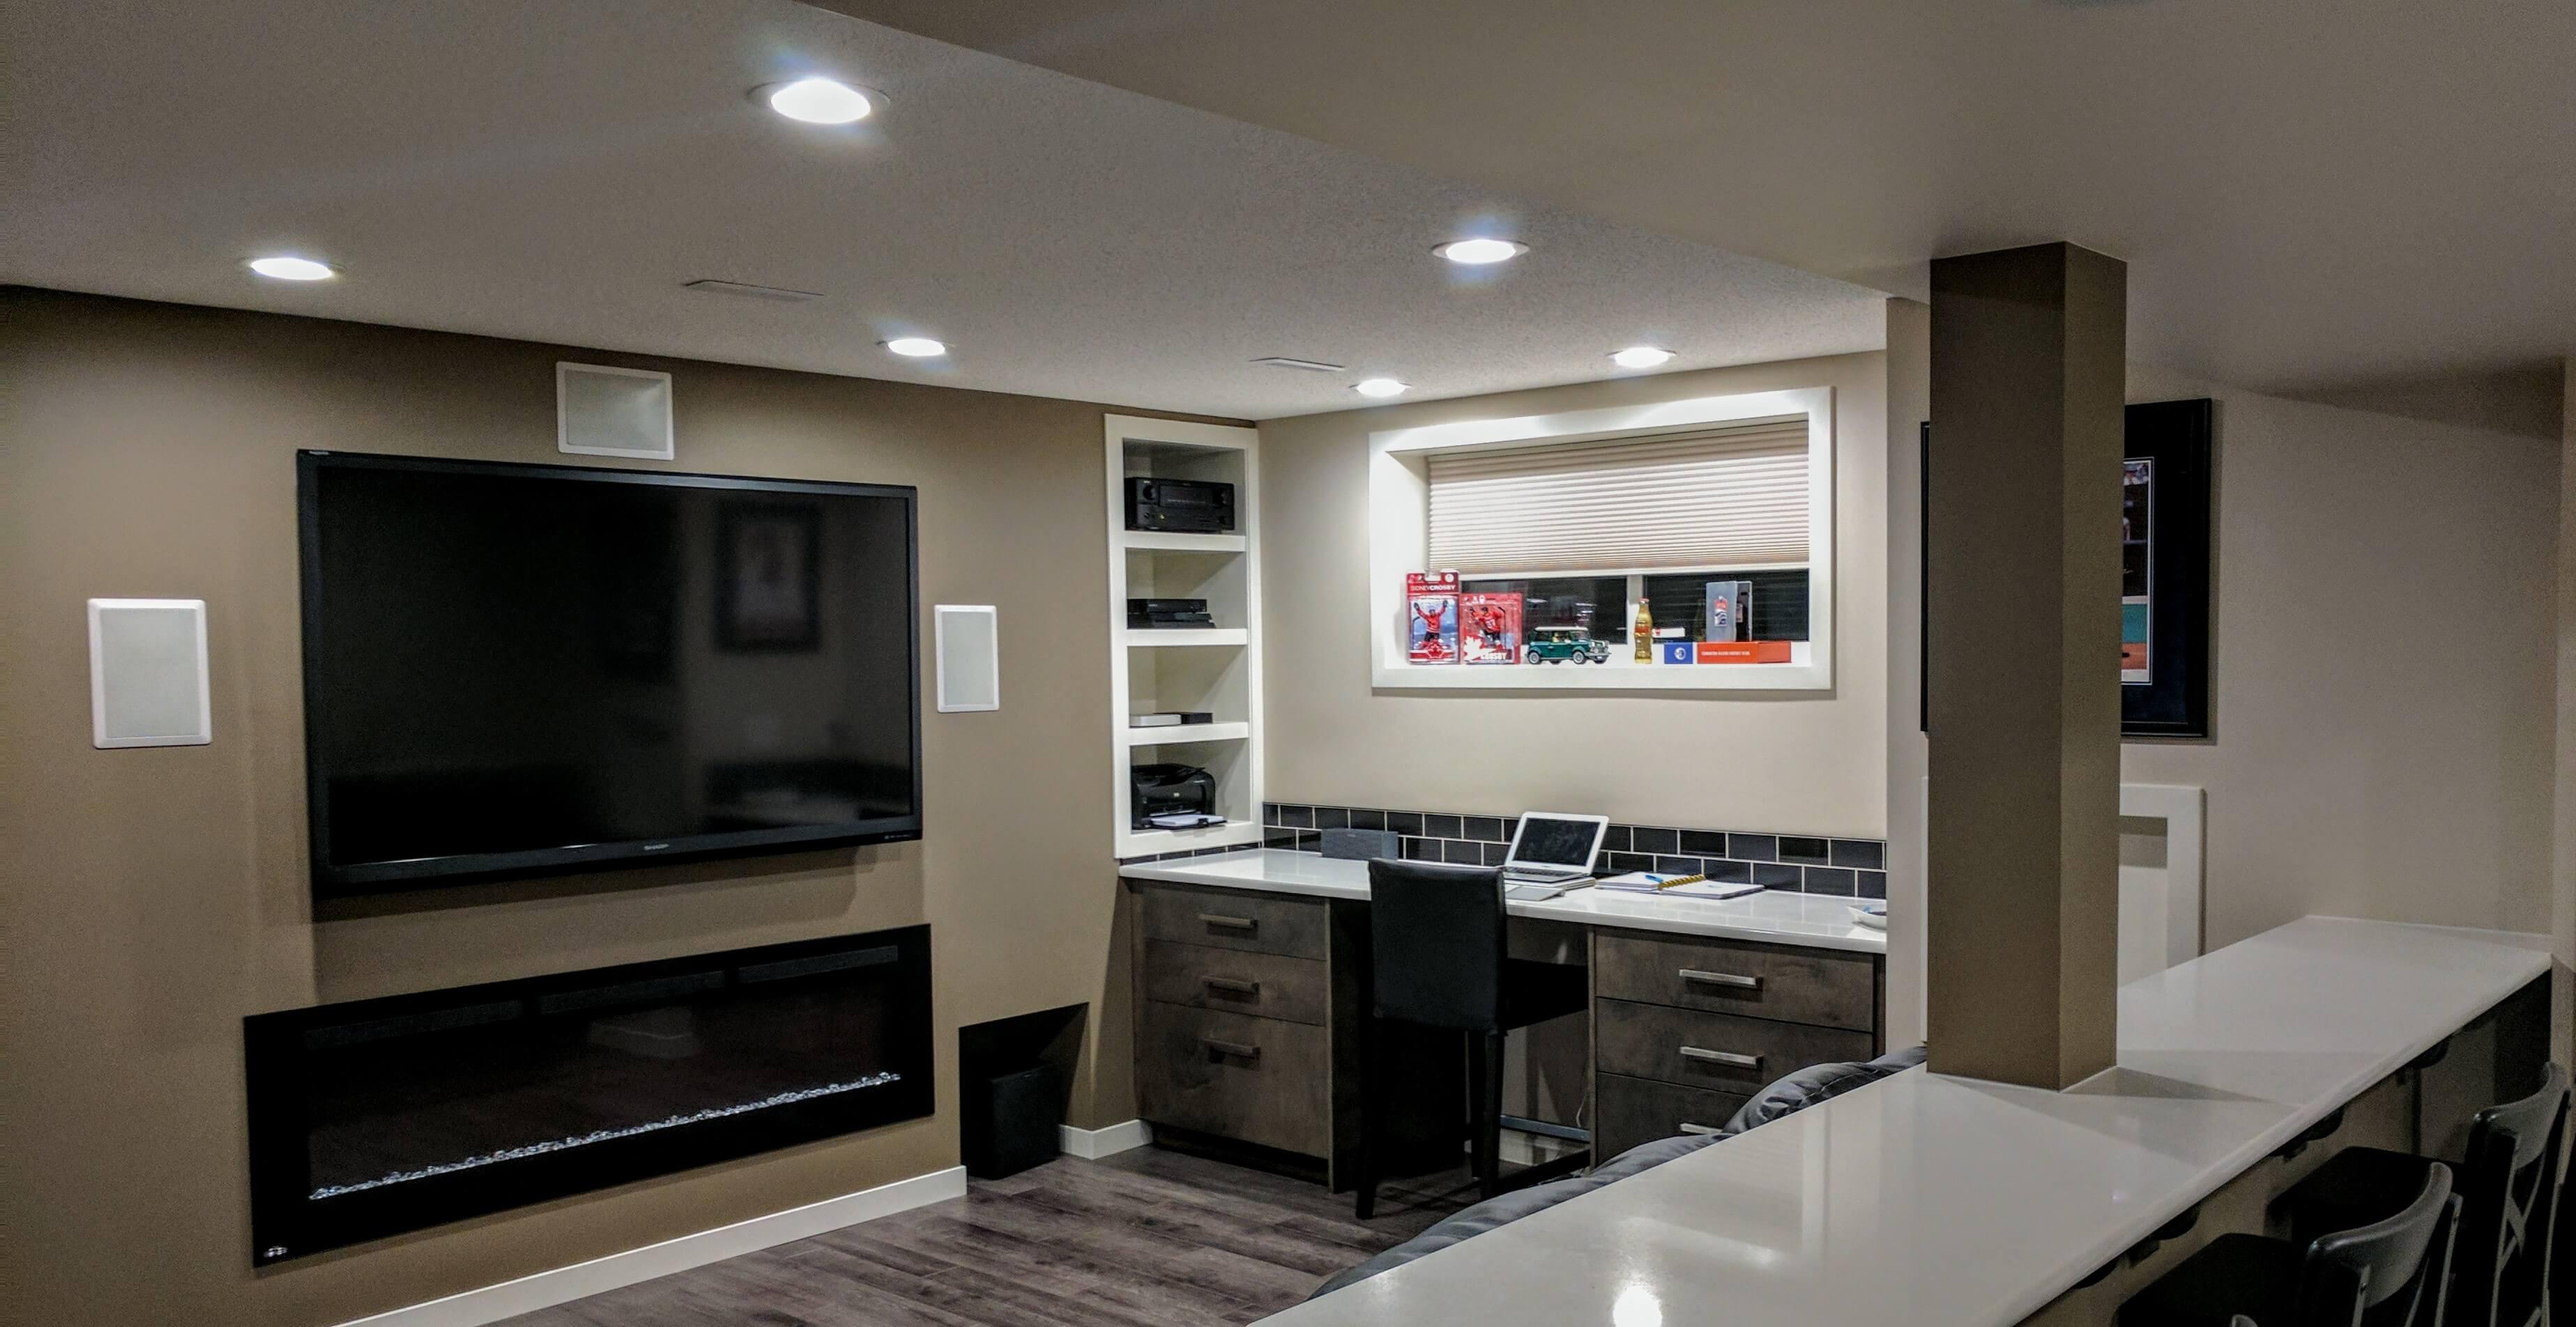 Residential LED Lighting Upgrade Calgary & Residential LED Lighting Upgrade Calgary - Virtuoso Energy azcodes.com